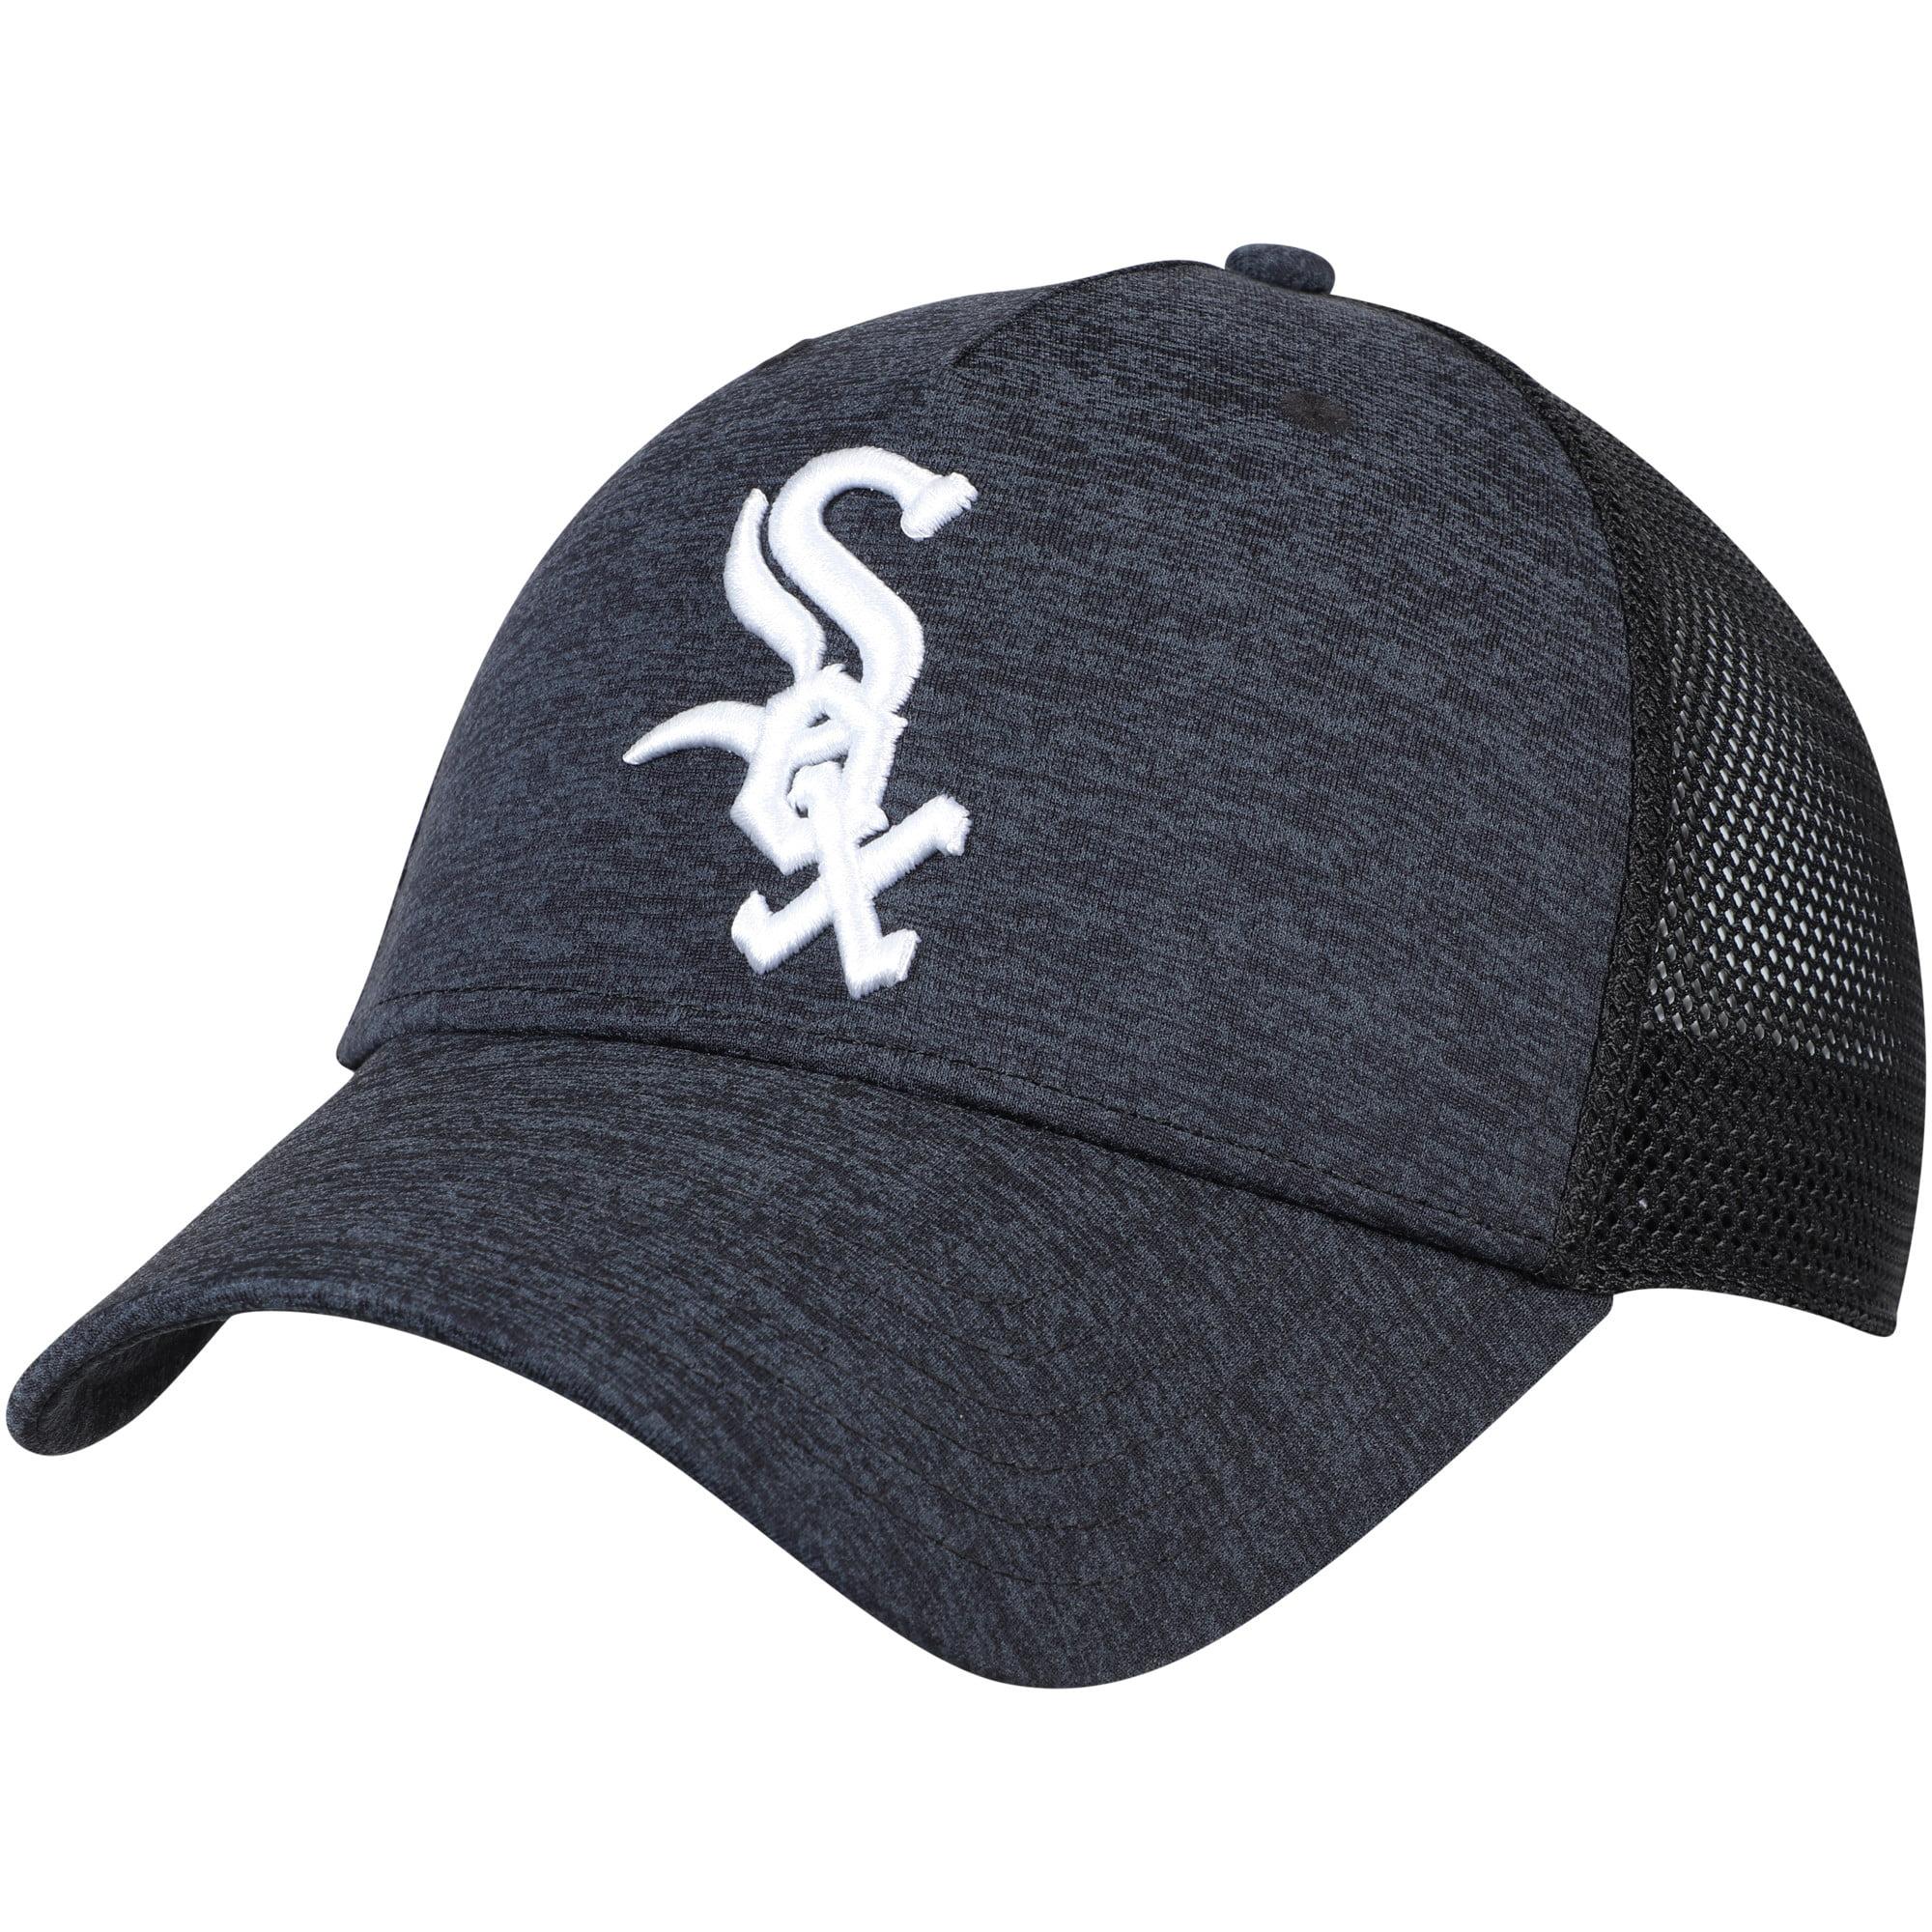 Chicago White Sox Under Armour Twist Closer Trucker Performance Adjustable Hat - Black - OSFA